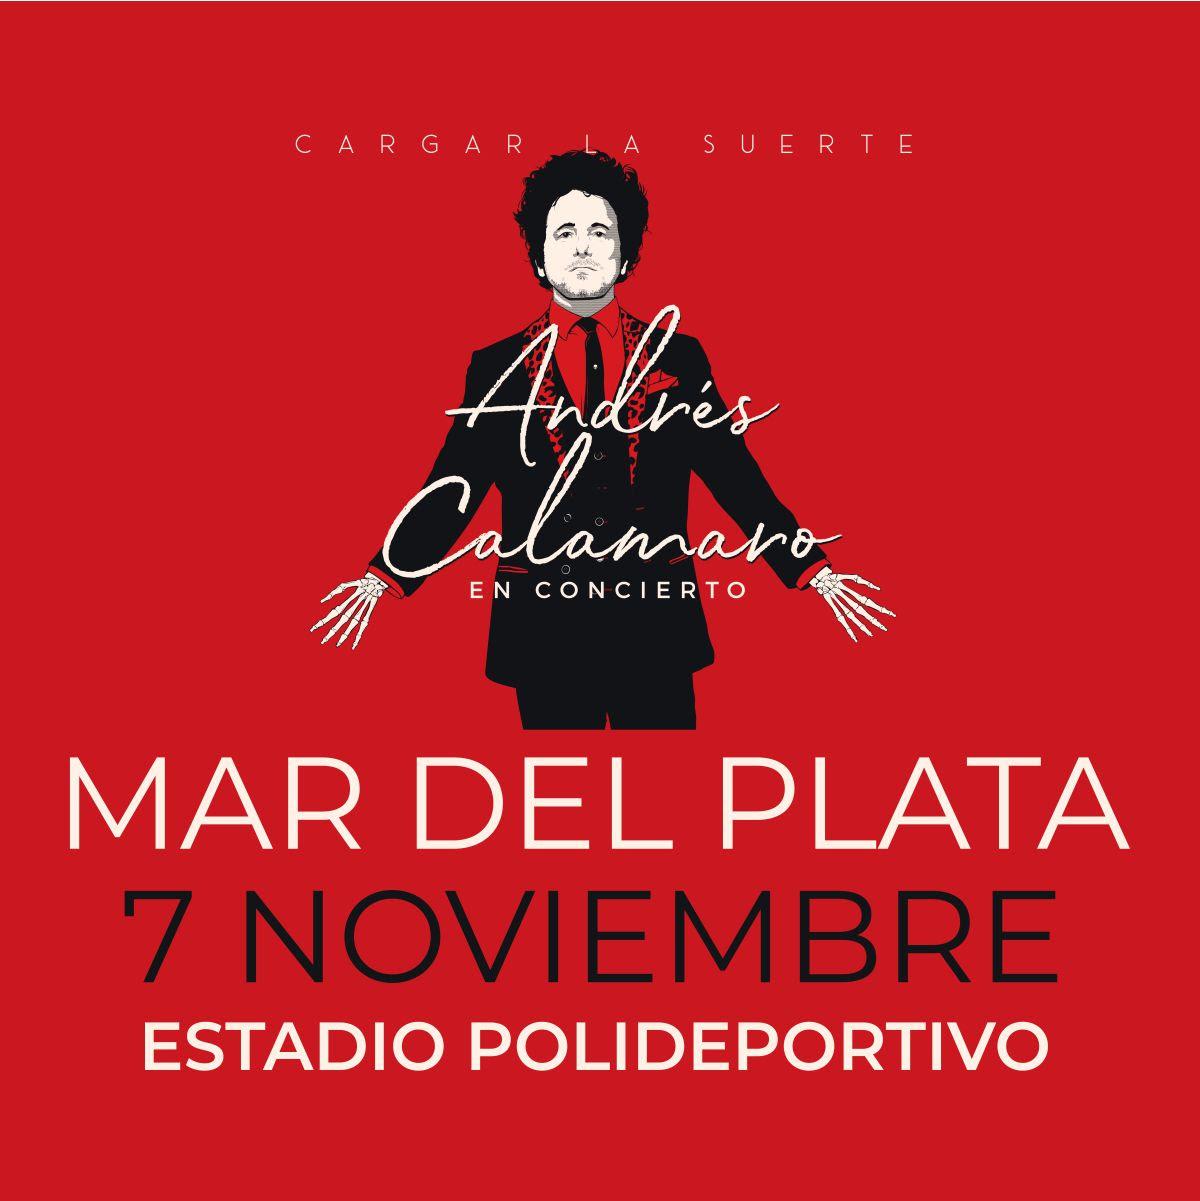 Andrés Calamaro llega a Mar del Plata en el tramo argentino de su gira Cargar la Suerte